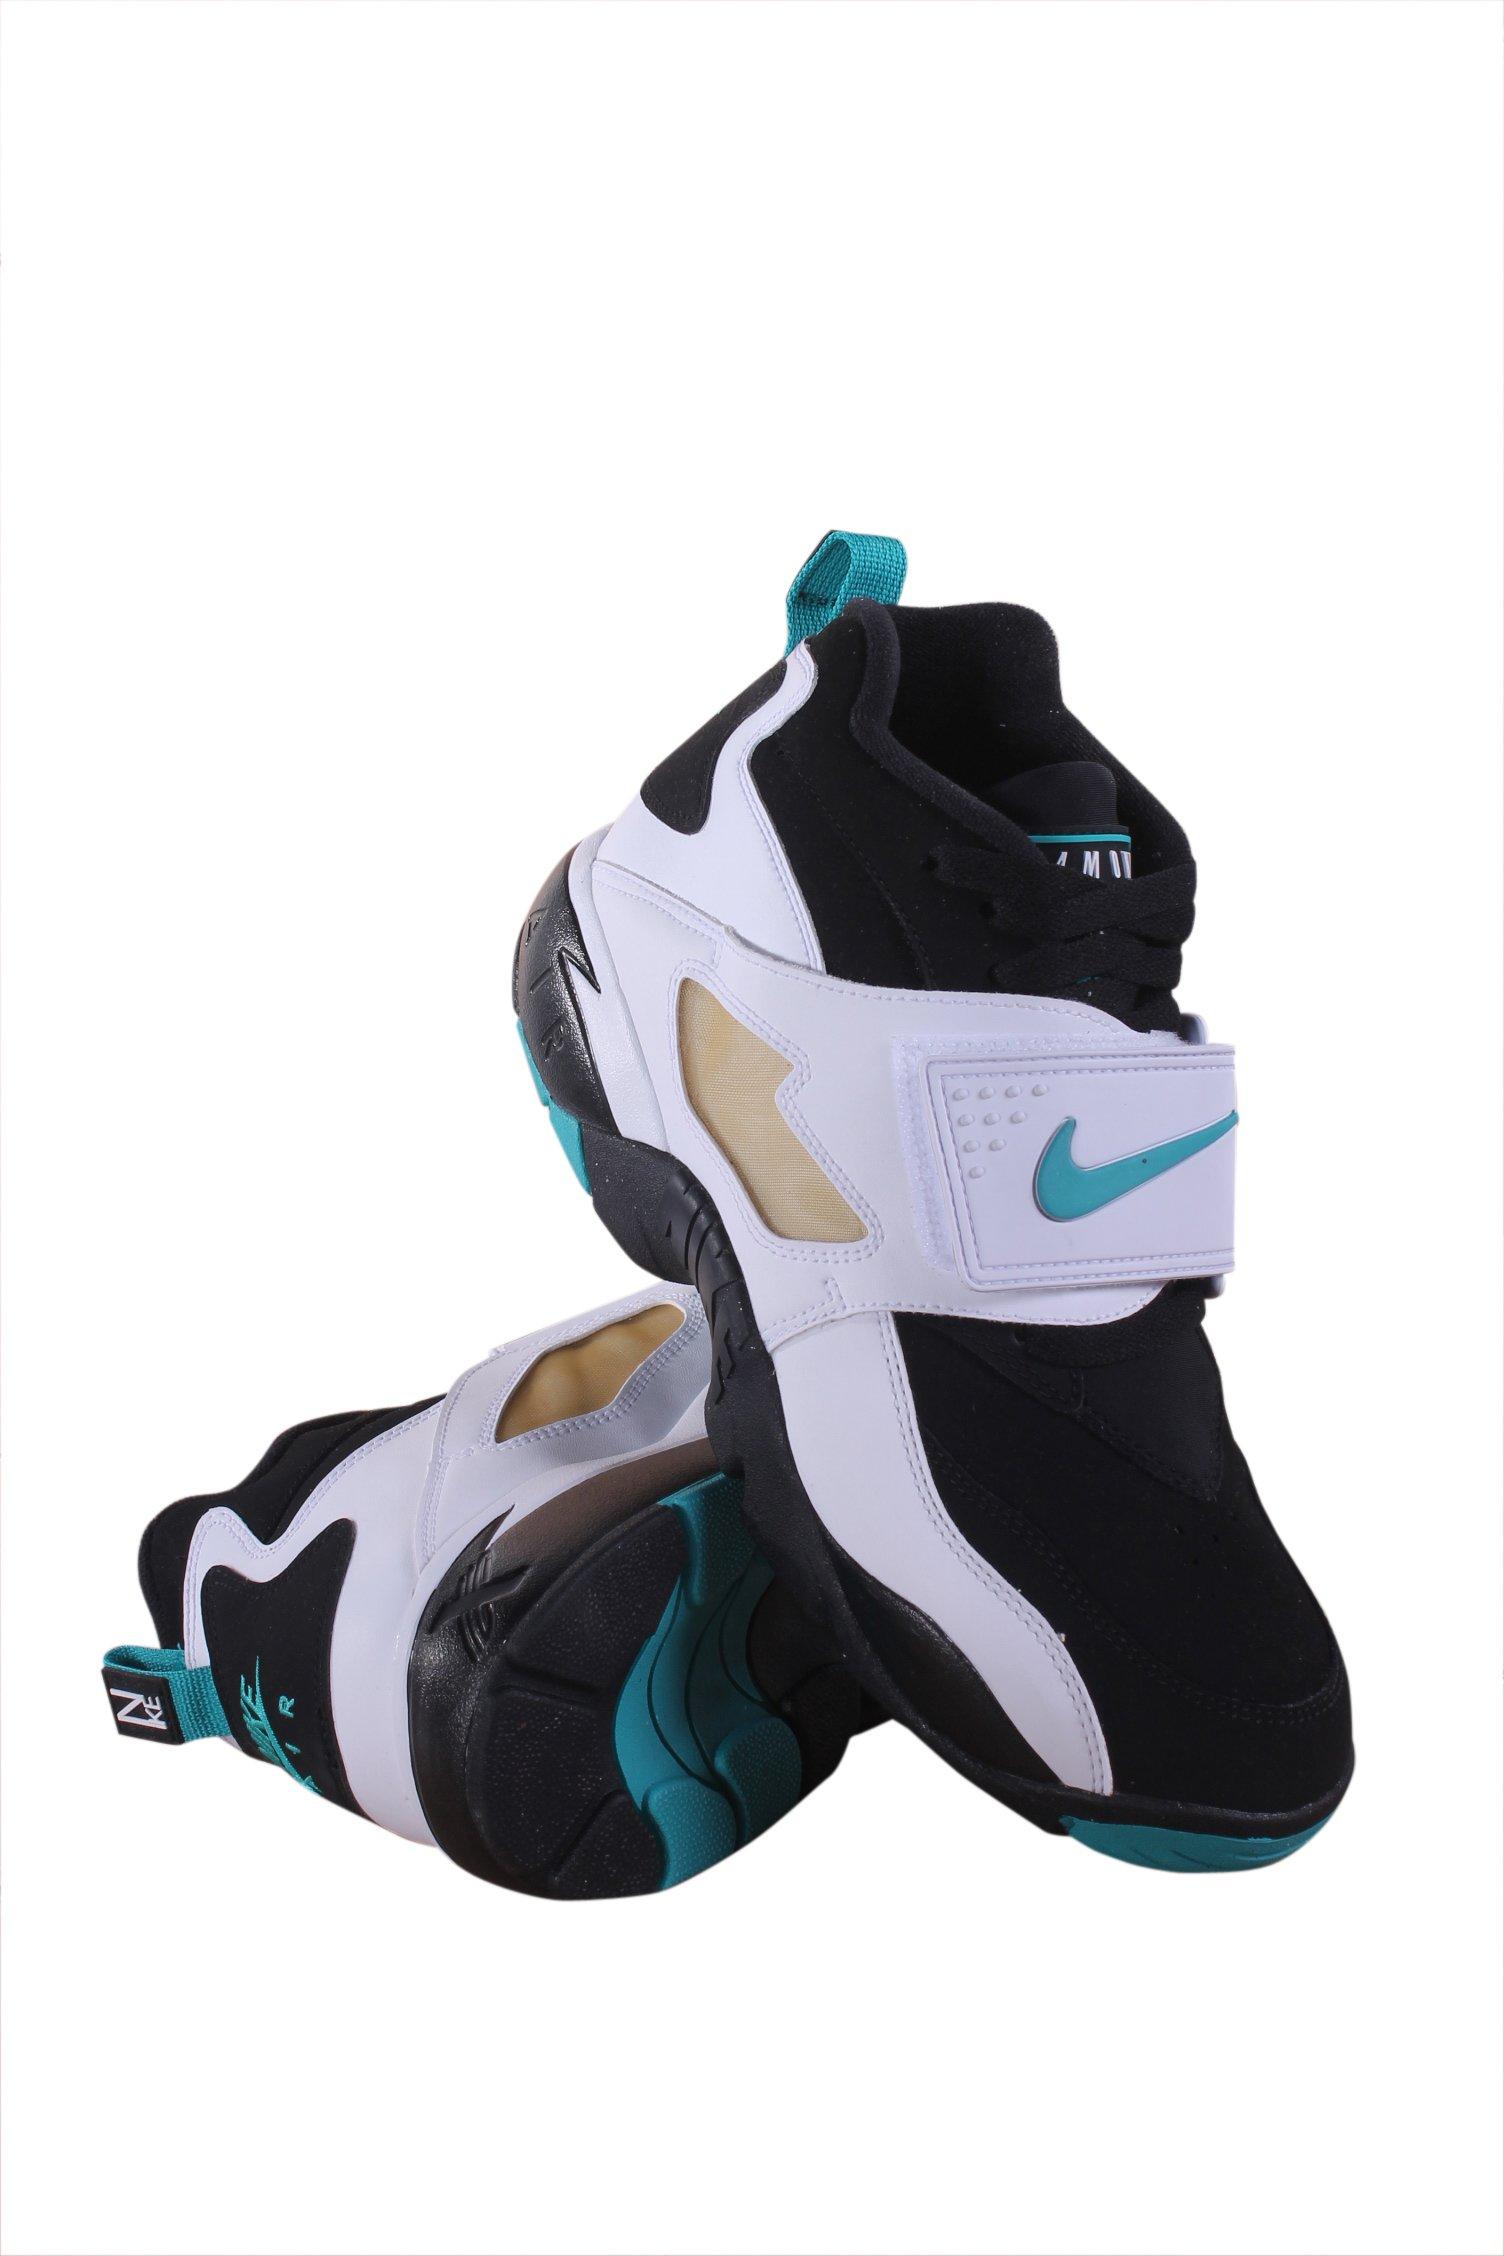 Nike 309434-013 Men AIR Diamond Turf Black DEEP Emerald White Metal by Nike (Image #1)